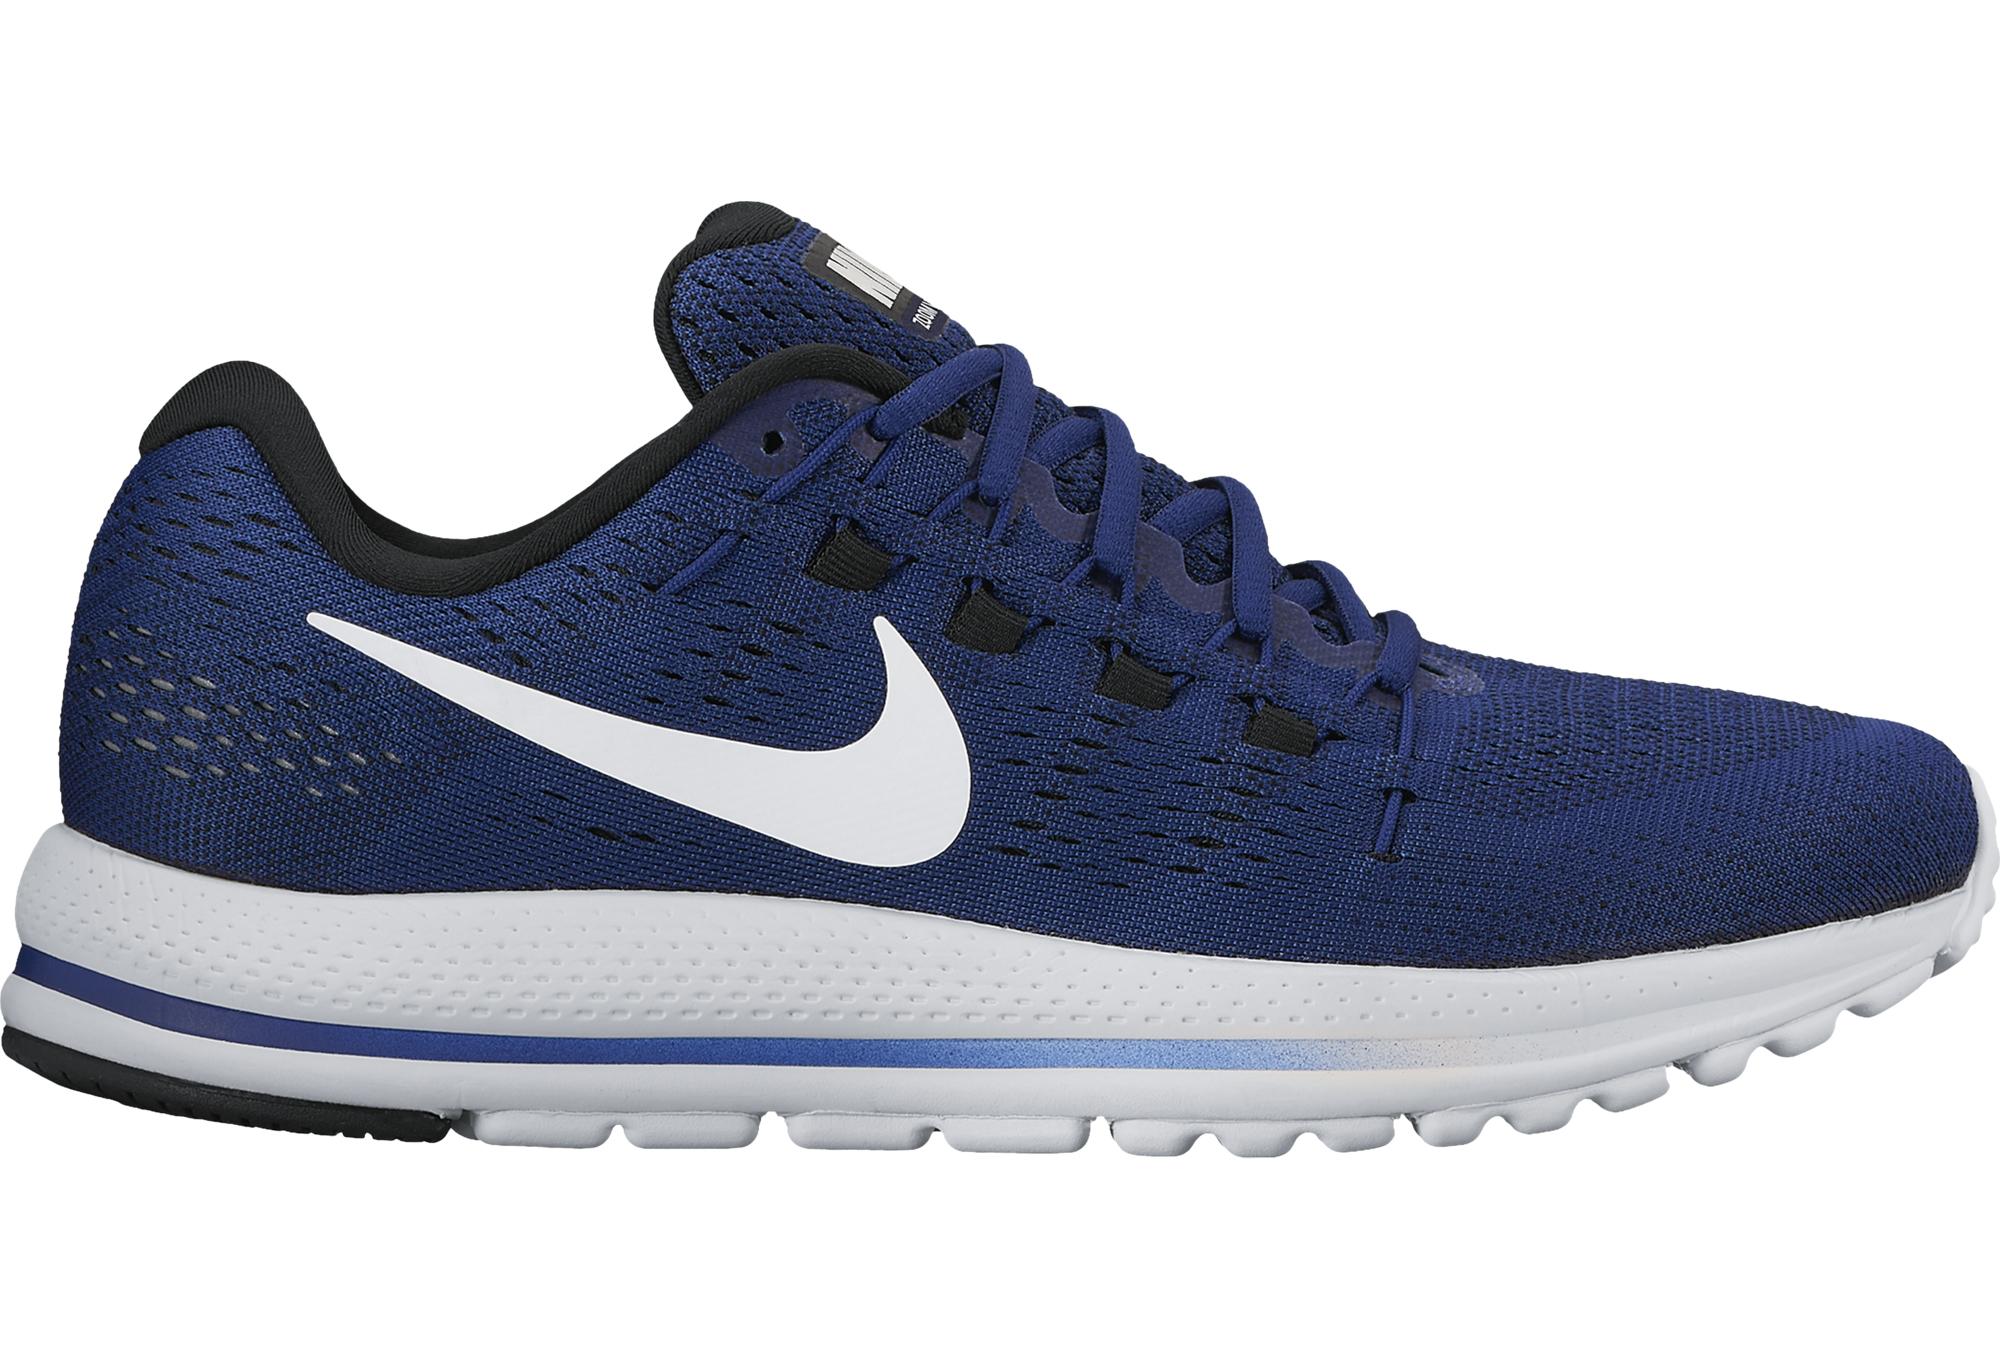 82c6756fb0c23 Chaussures de Running Nike AIR ZOOM VOMERO 12 Bleu